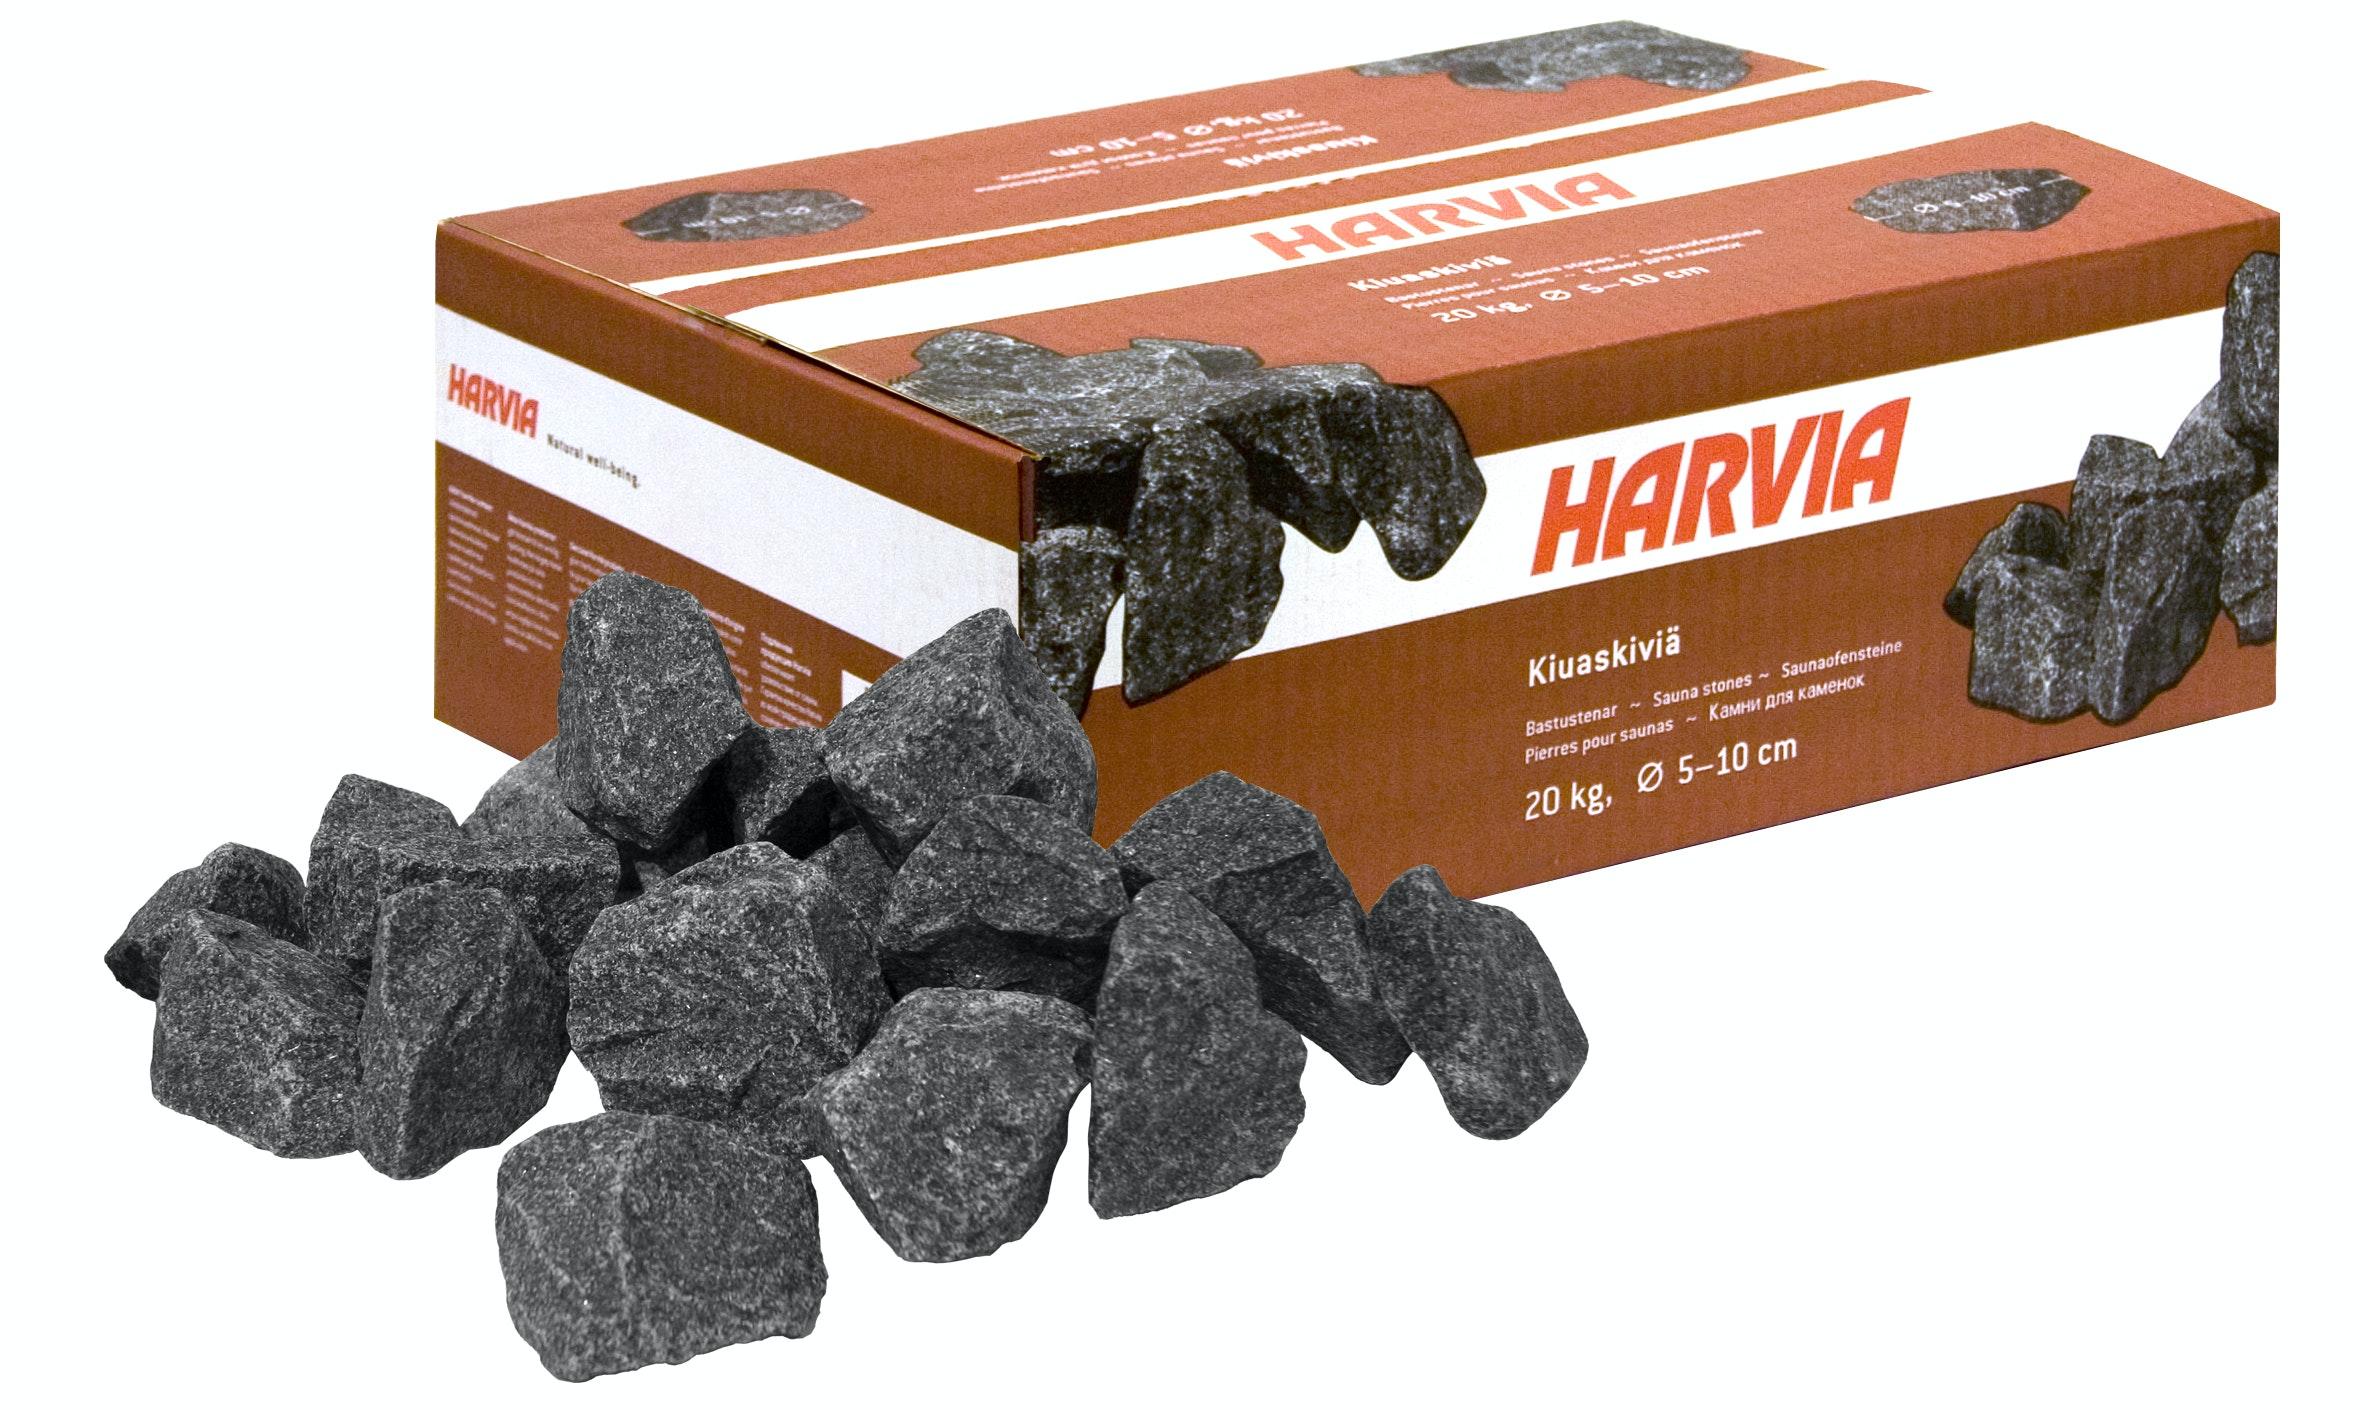 Bastusten Harvia Ø 5-10cm AC3000 20kg